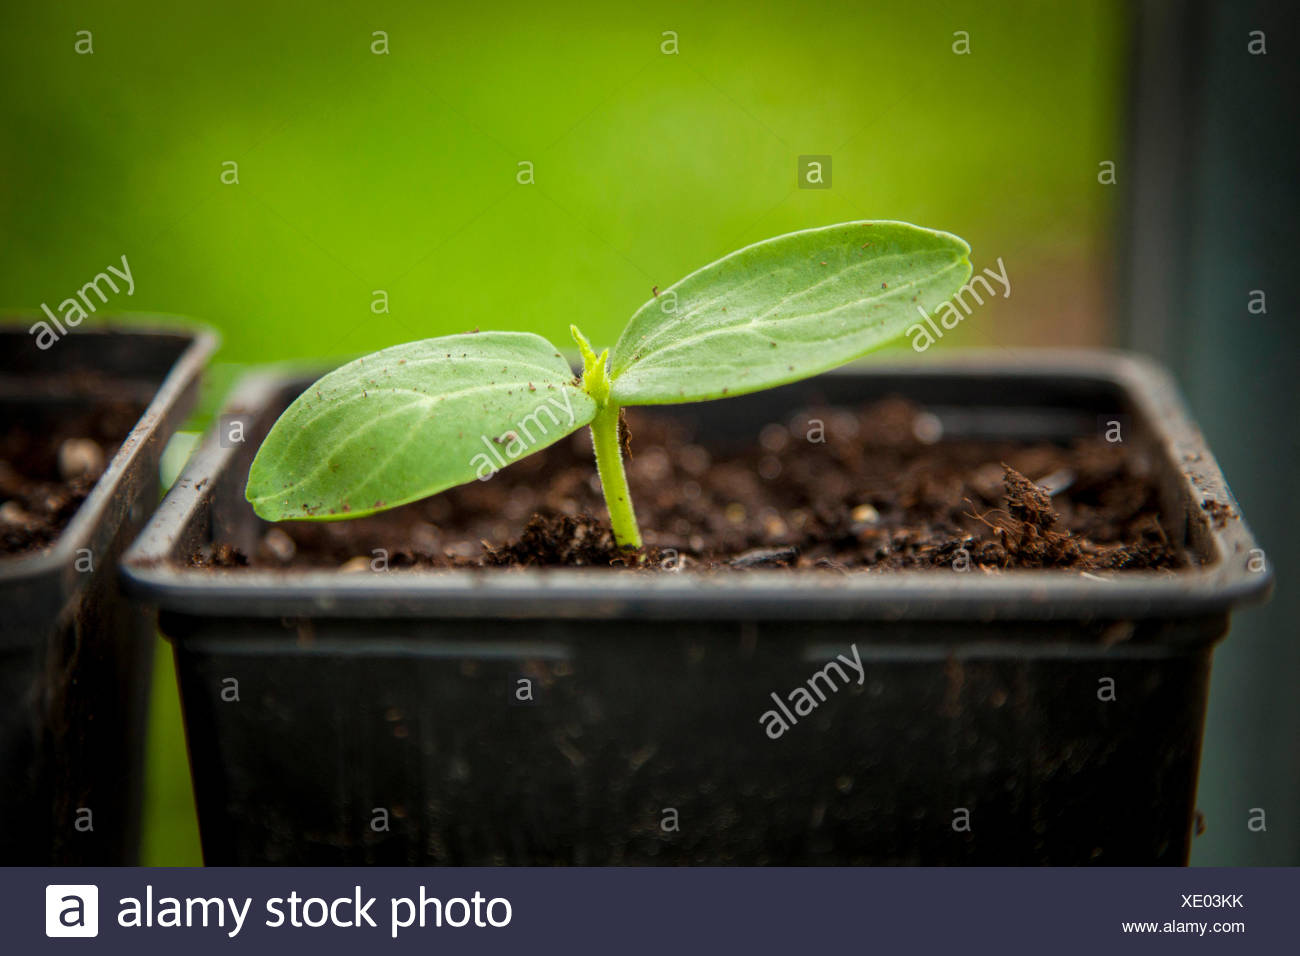 marrow, field pumpkin (Cucurbita pepo), seedling, Germany - Stock Image